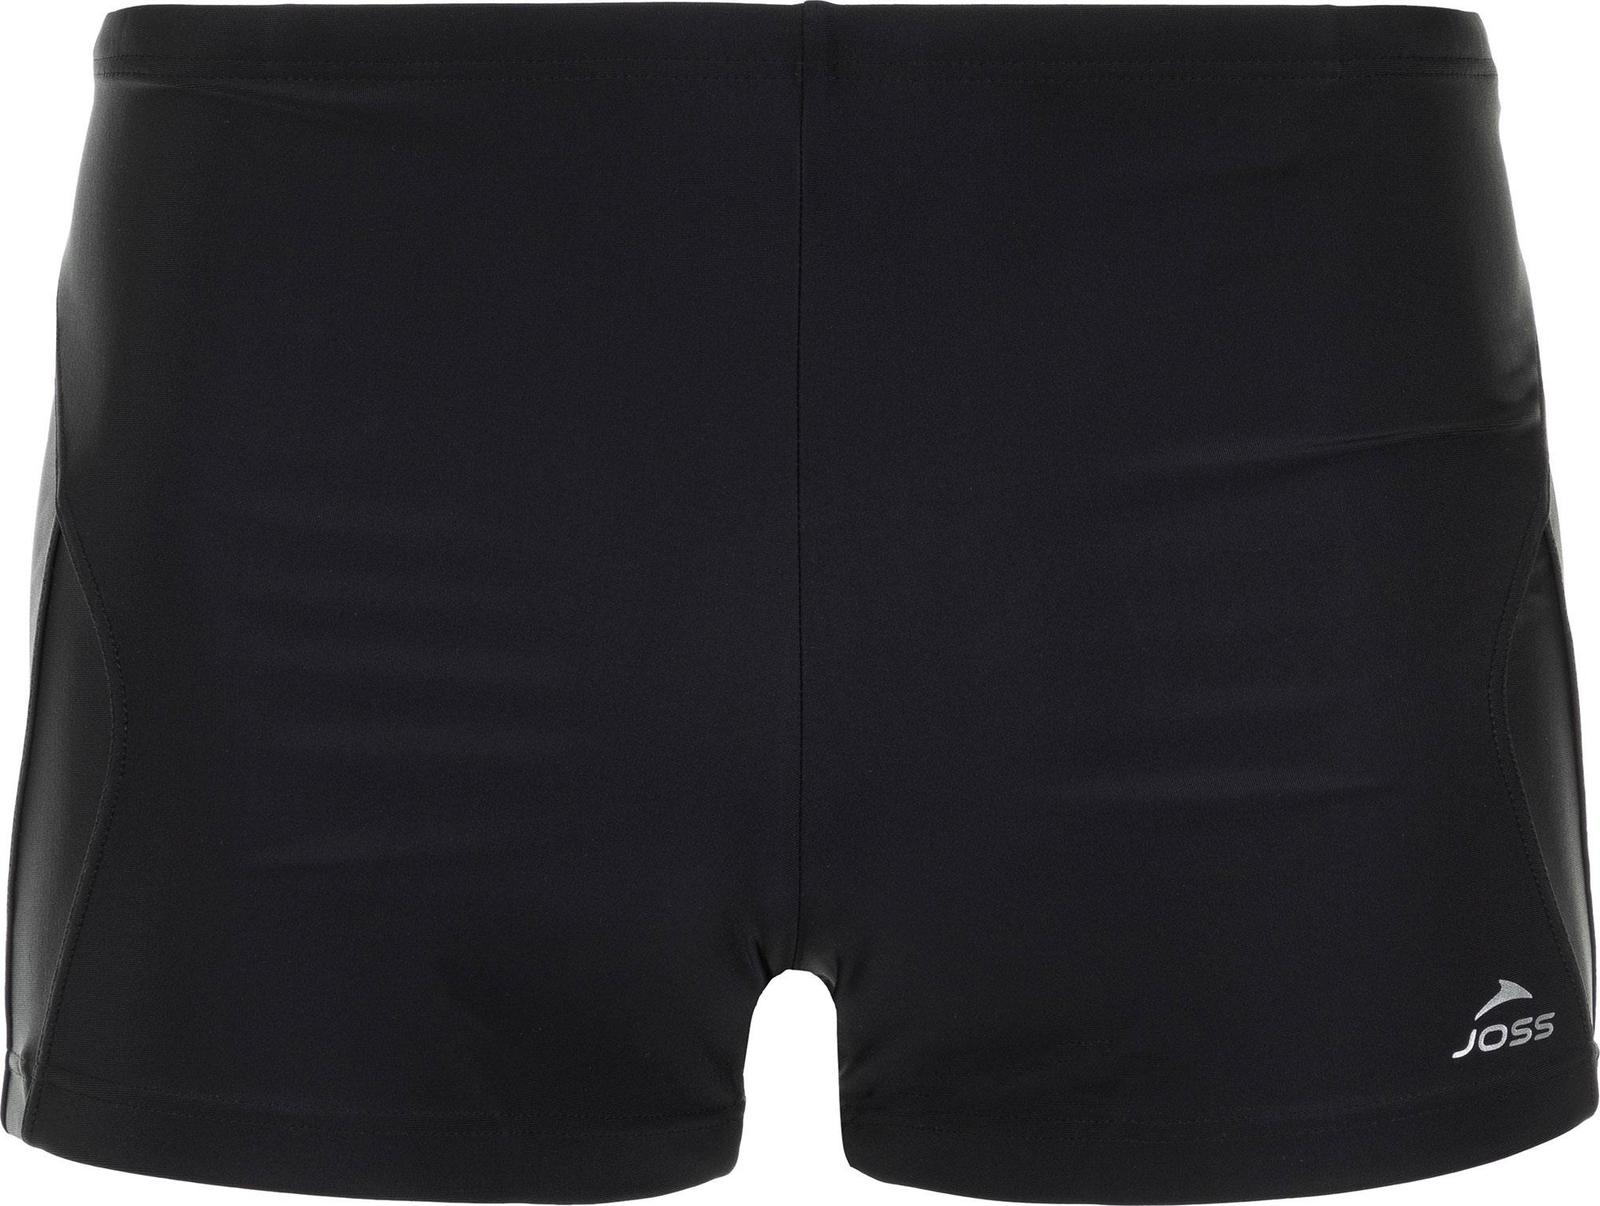 Плавки Joss Men's swim trunks плавки для мальчика joss boys swim trunks цвет черничный s19ajswtb01 v4 размер 152